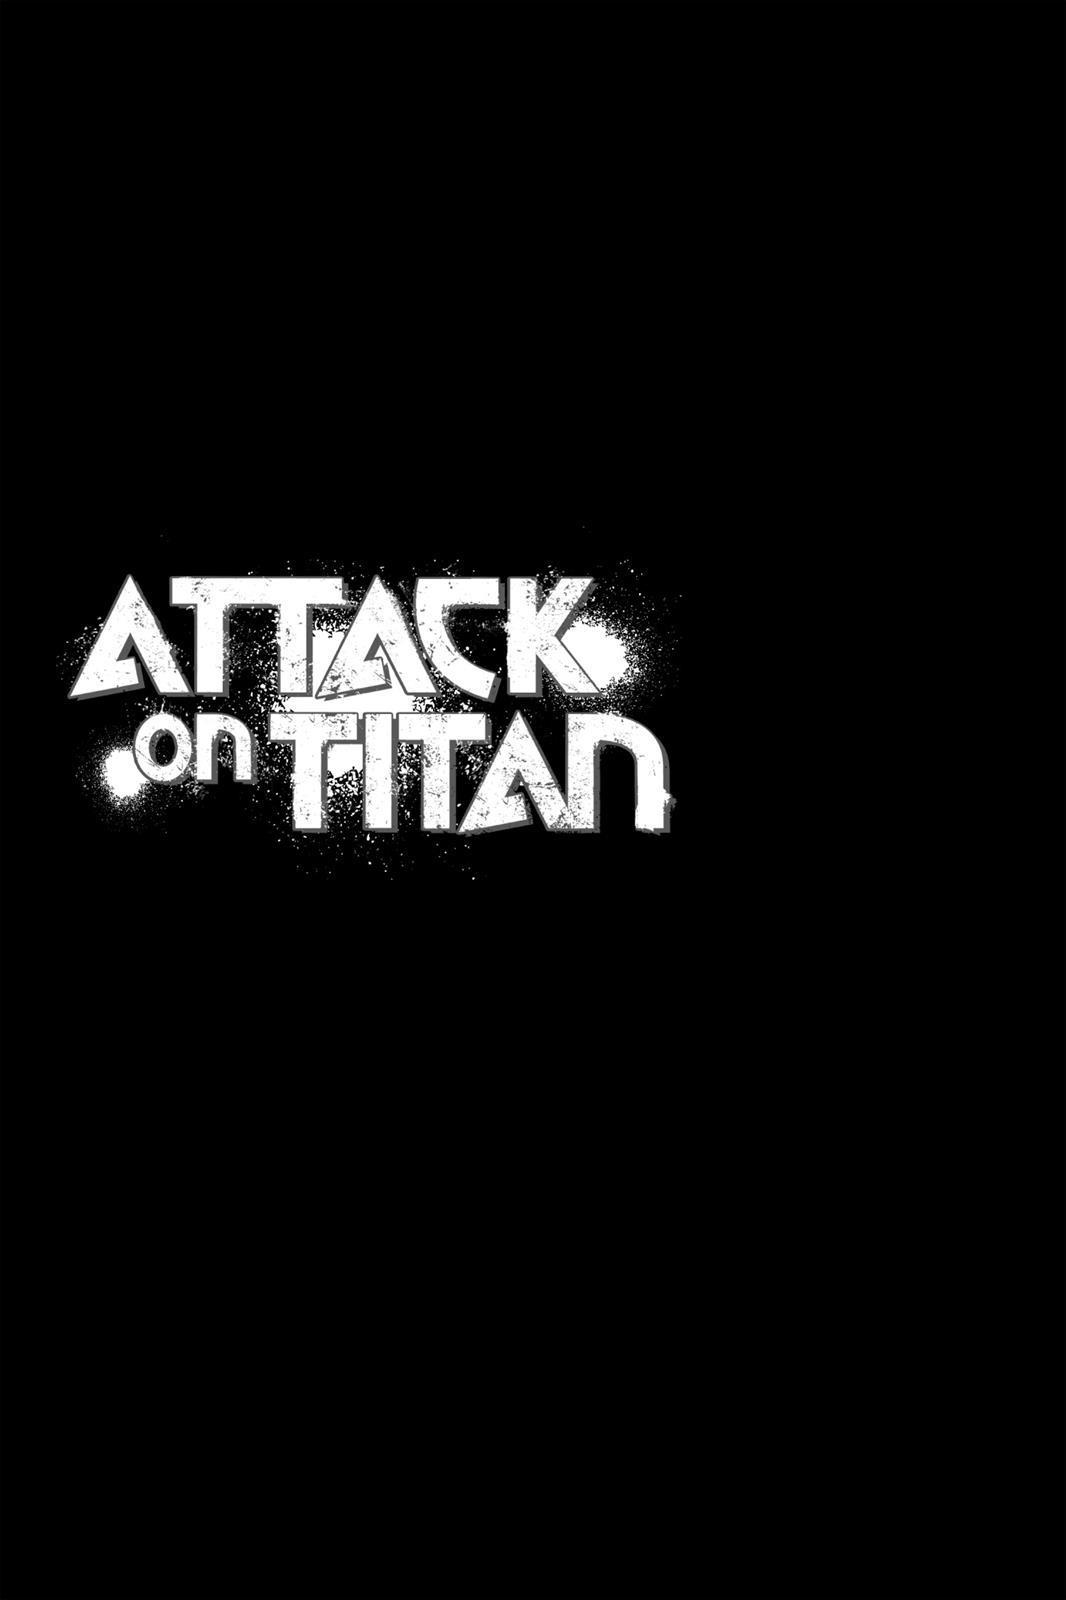 Attack On Titan, Episode 59 image 005